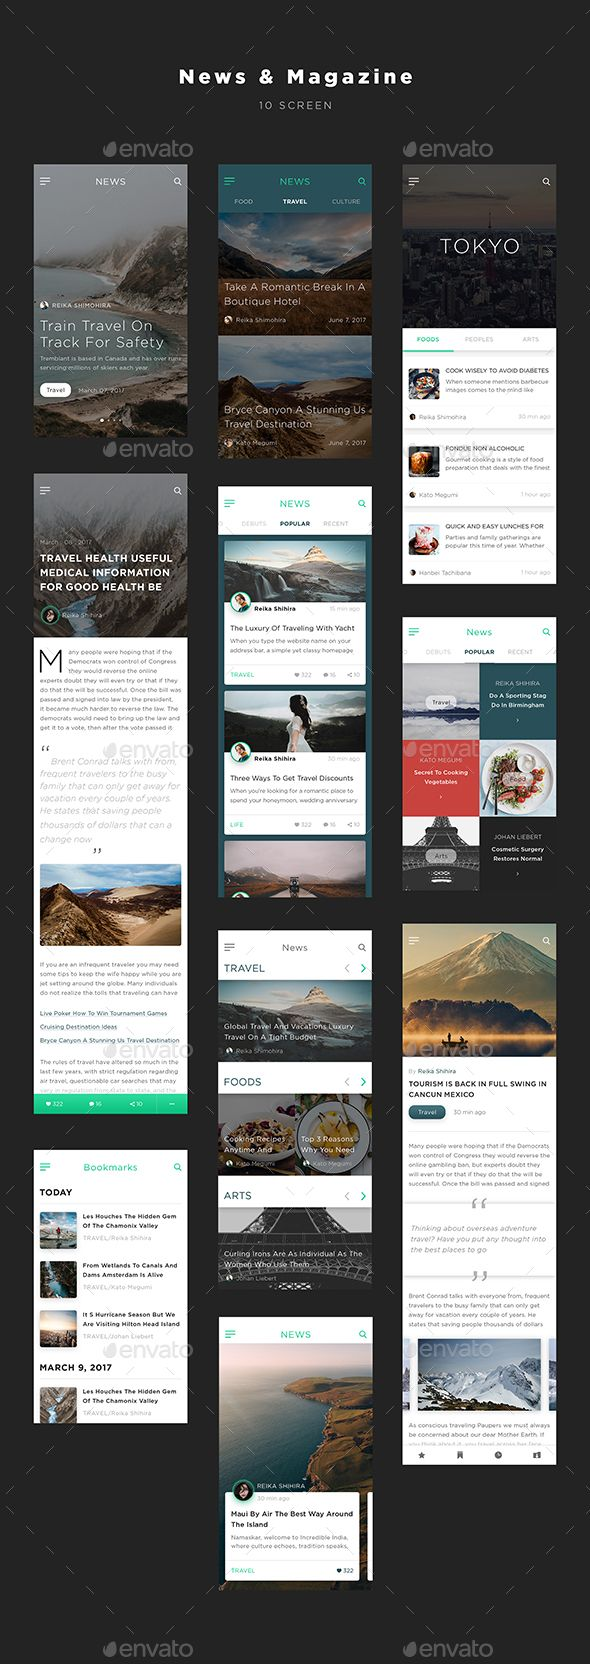 Mugen App UI KIT – News & Magazine (User Interfaces)